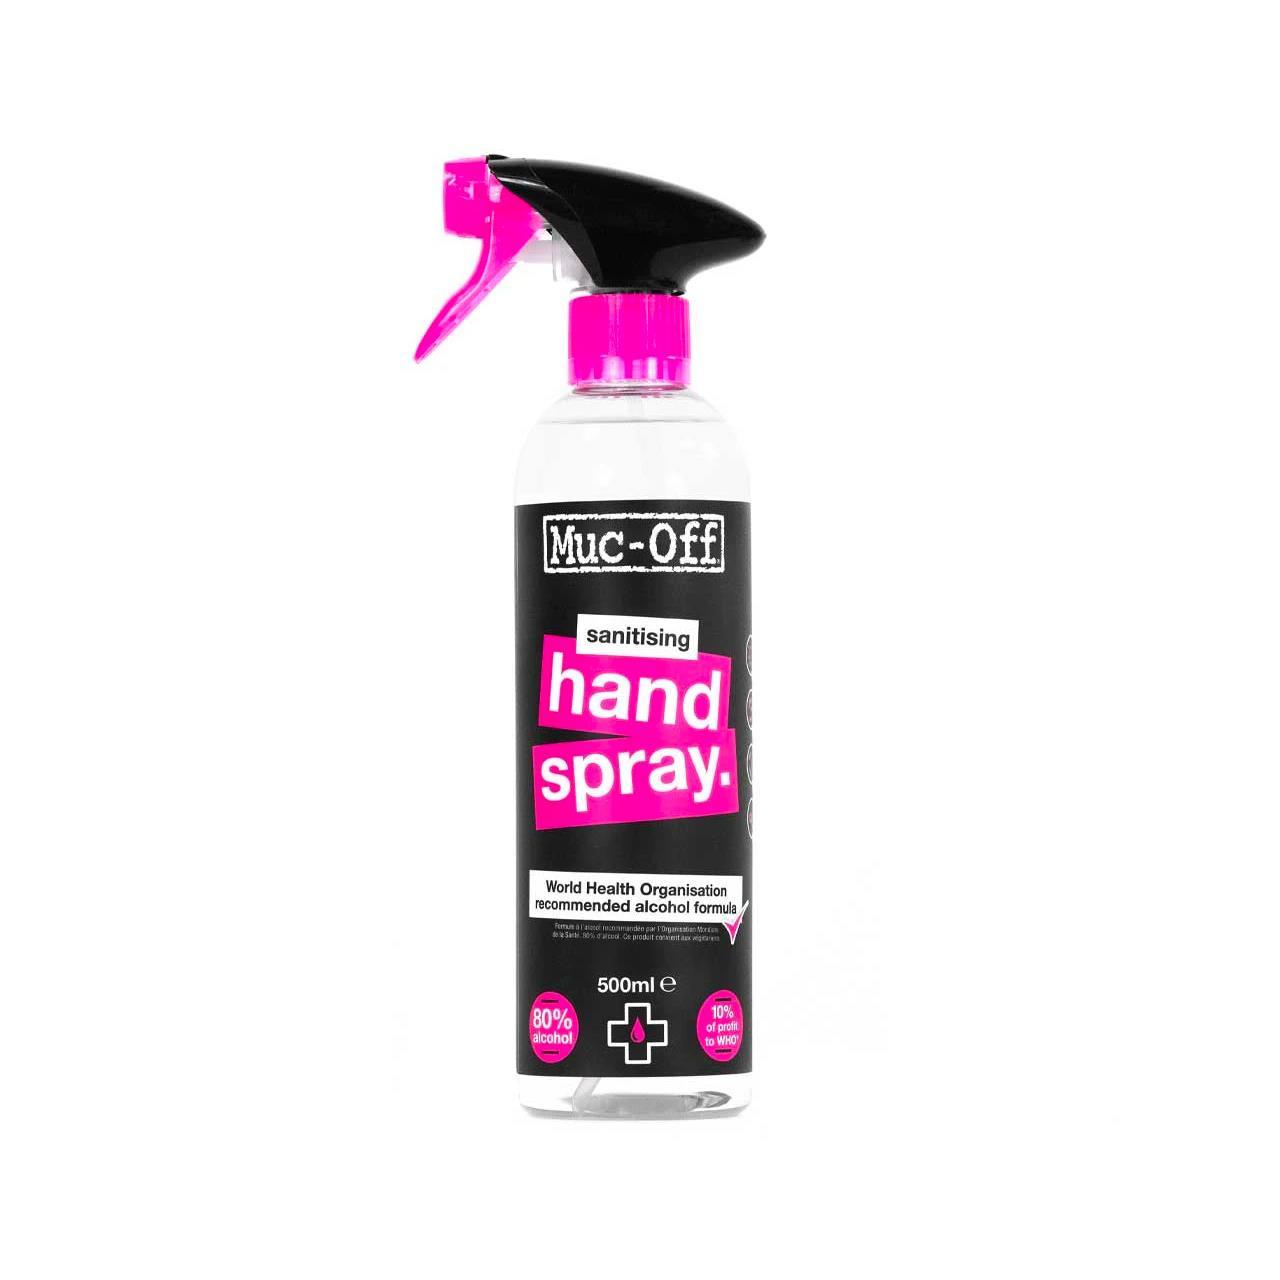 Muc-Off Antibacterial Sanitising Hand Spray (500ml)